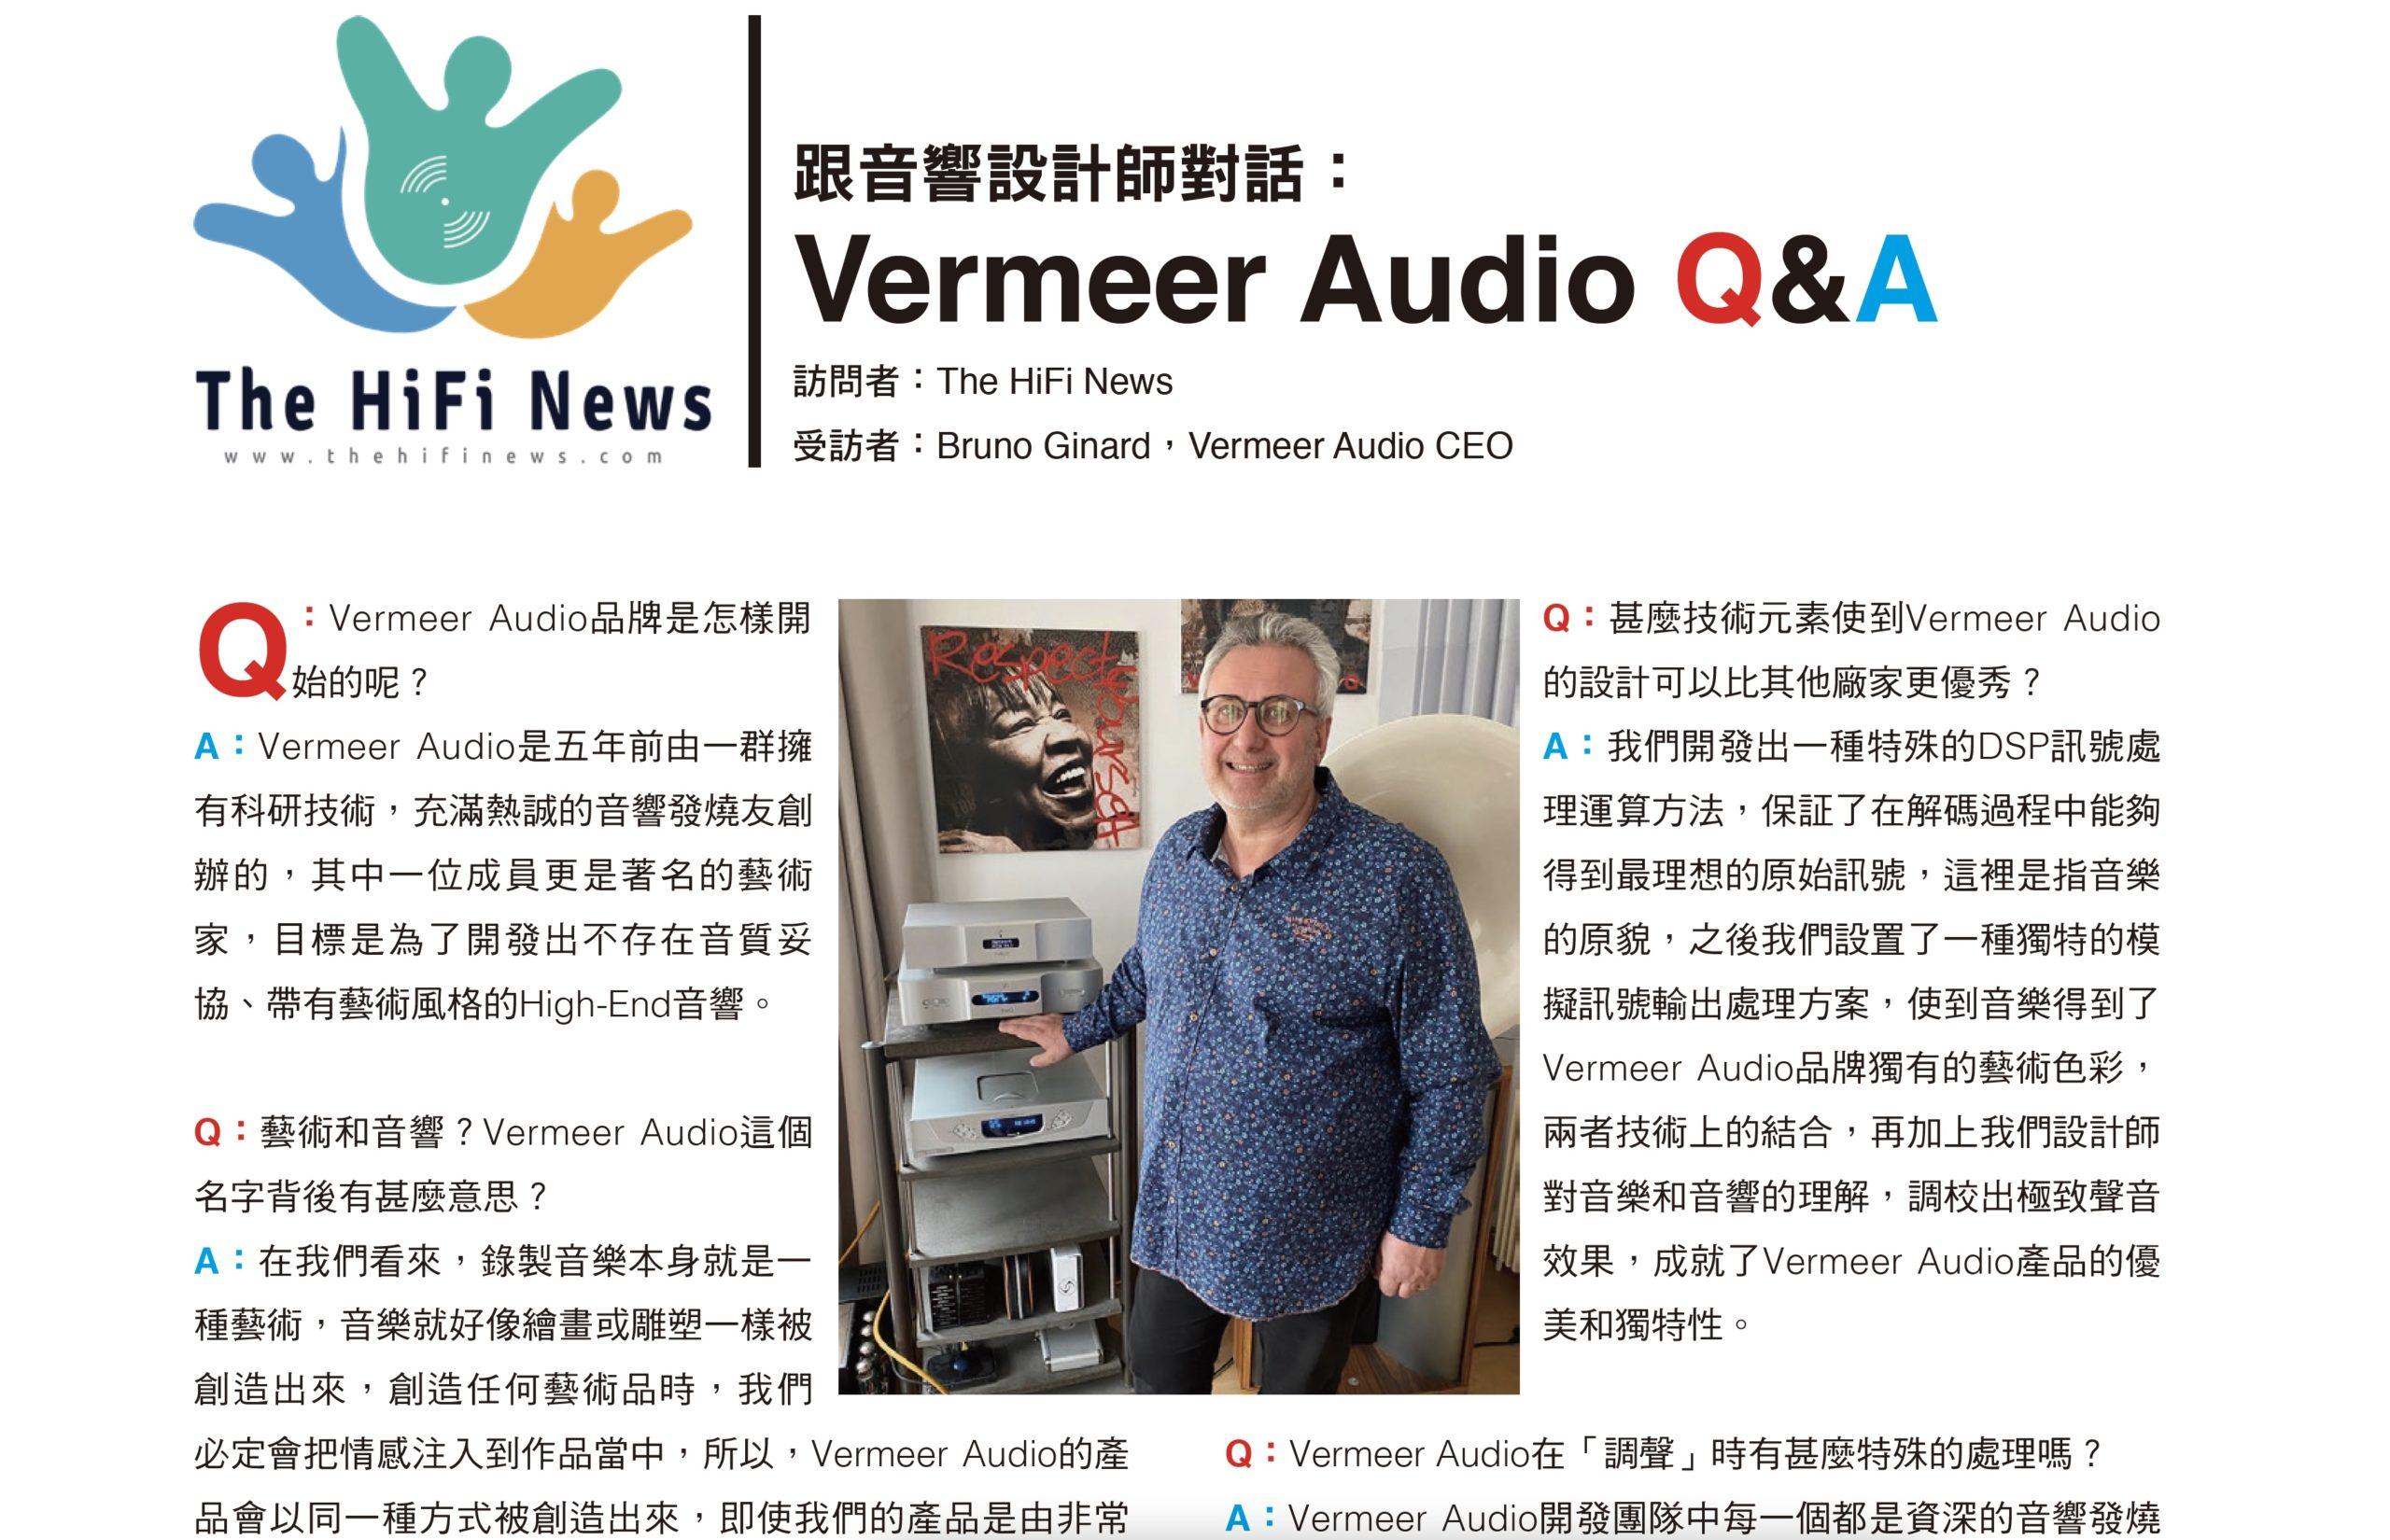 Vermeer Audio Q&A — The Hifi News